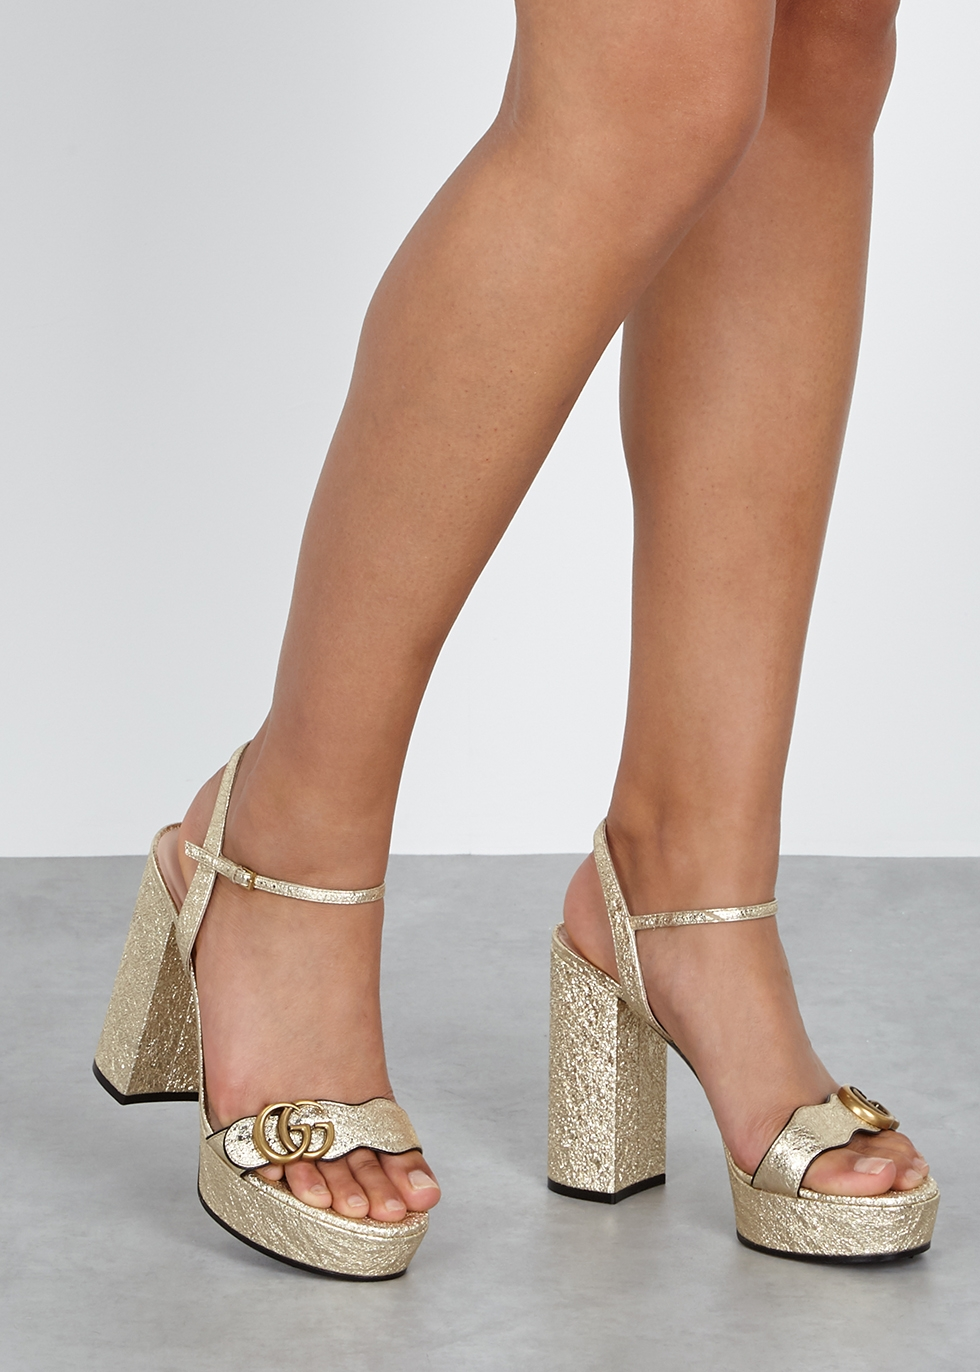 gucci marmont open toe sandals